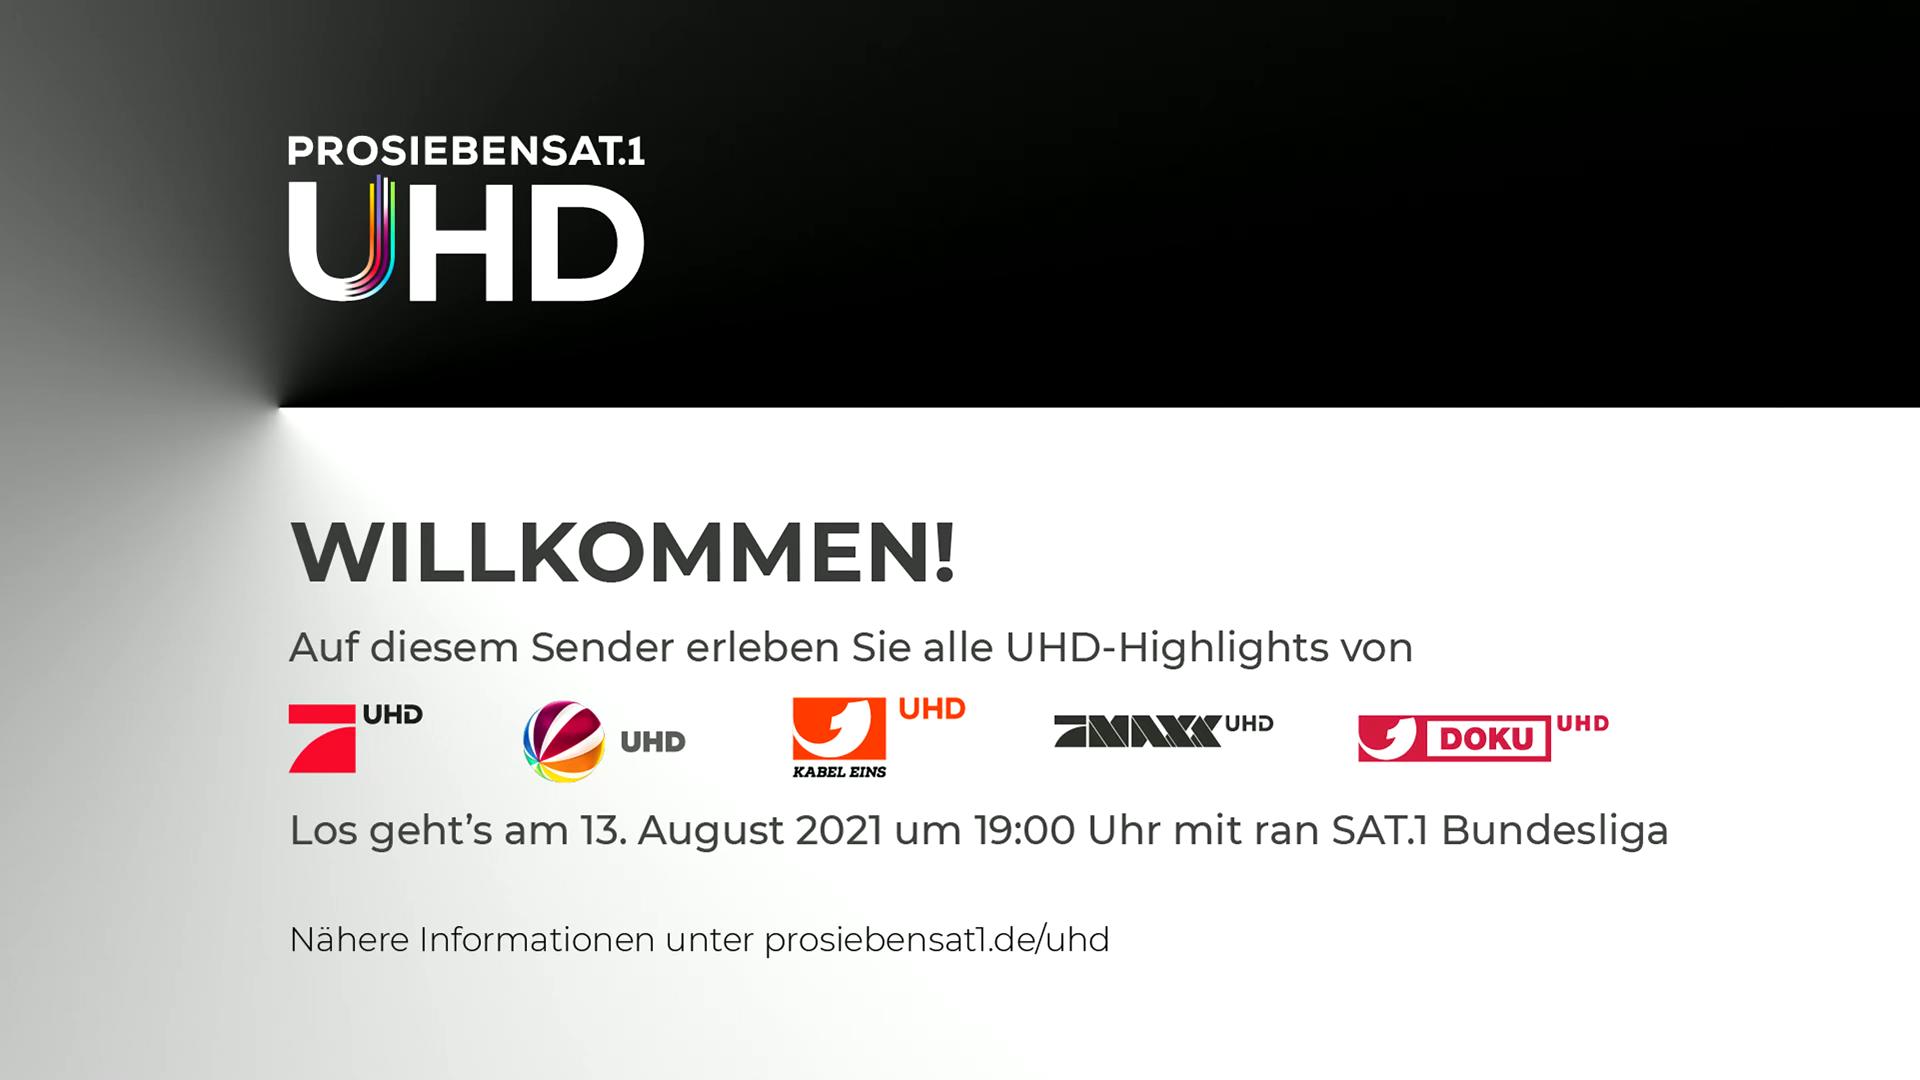 Pro7Sat.1 UHD Programminfo